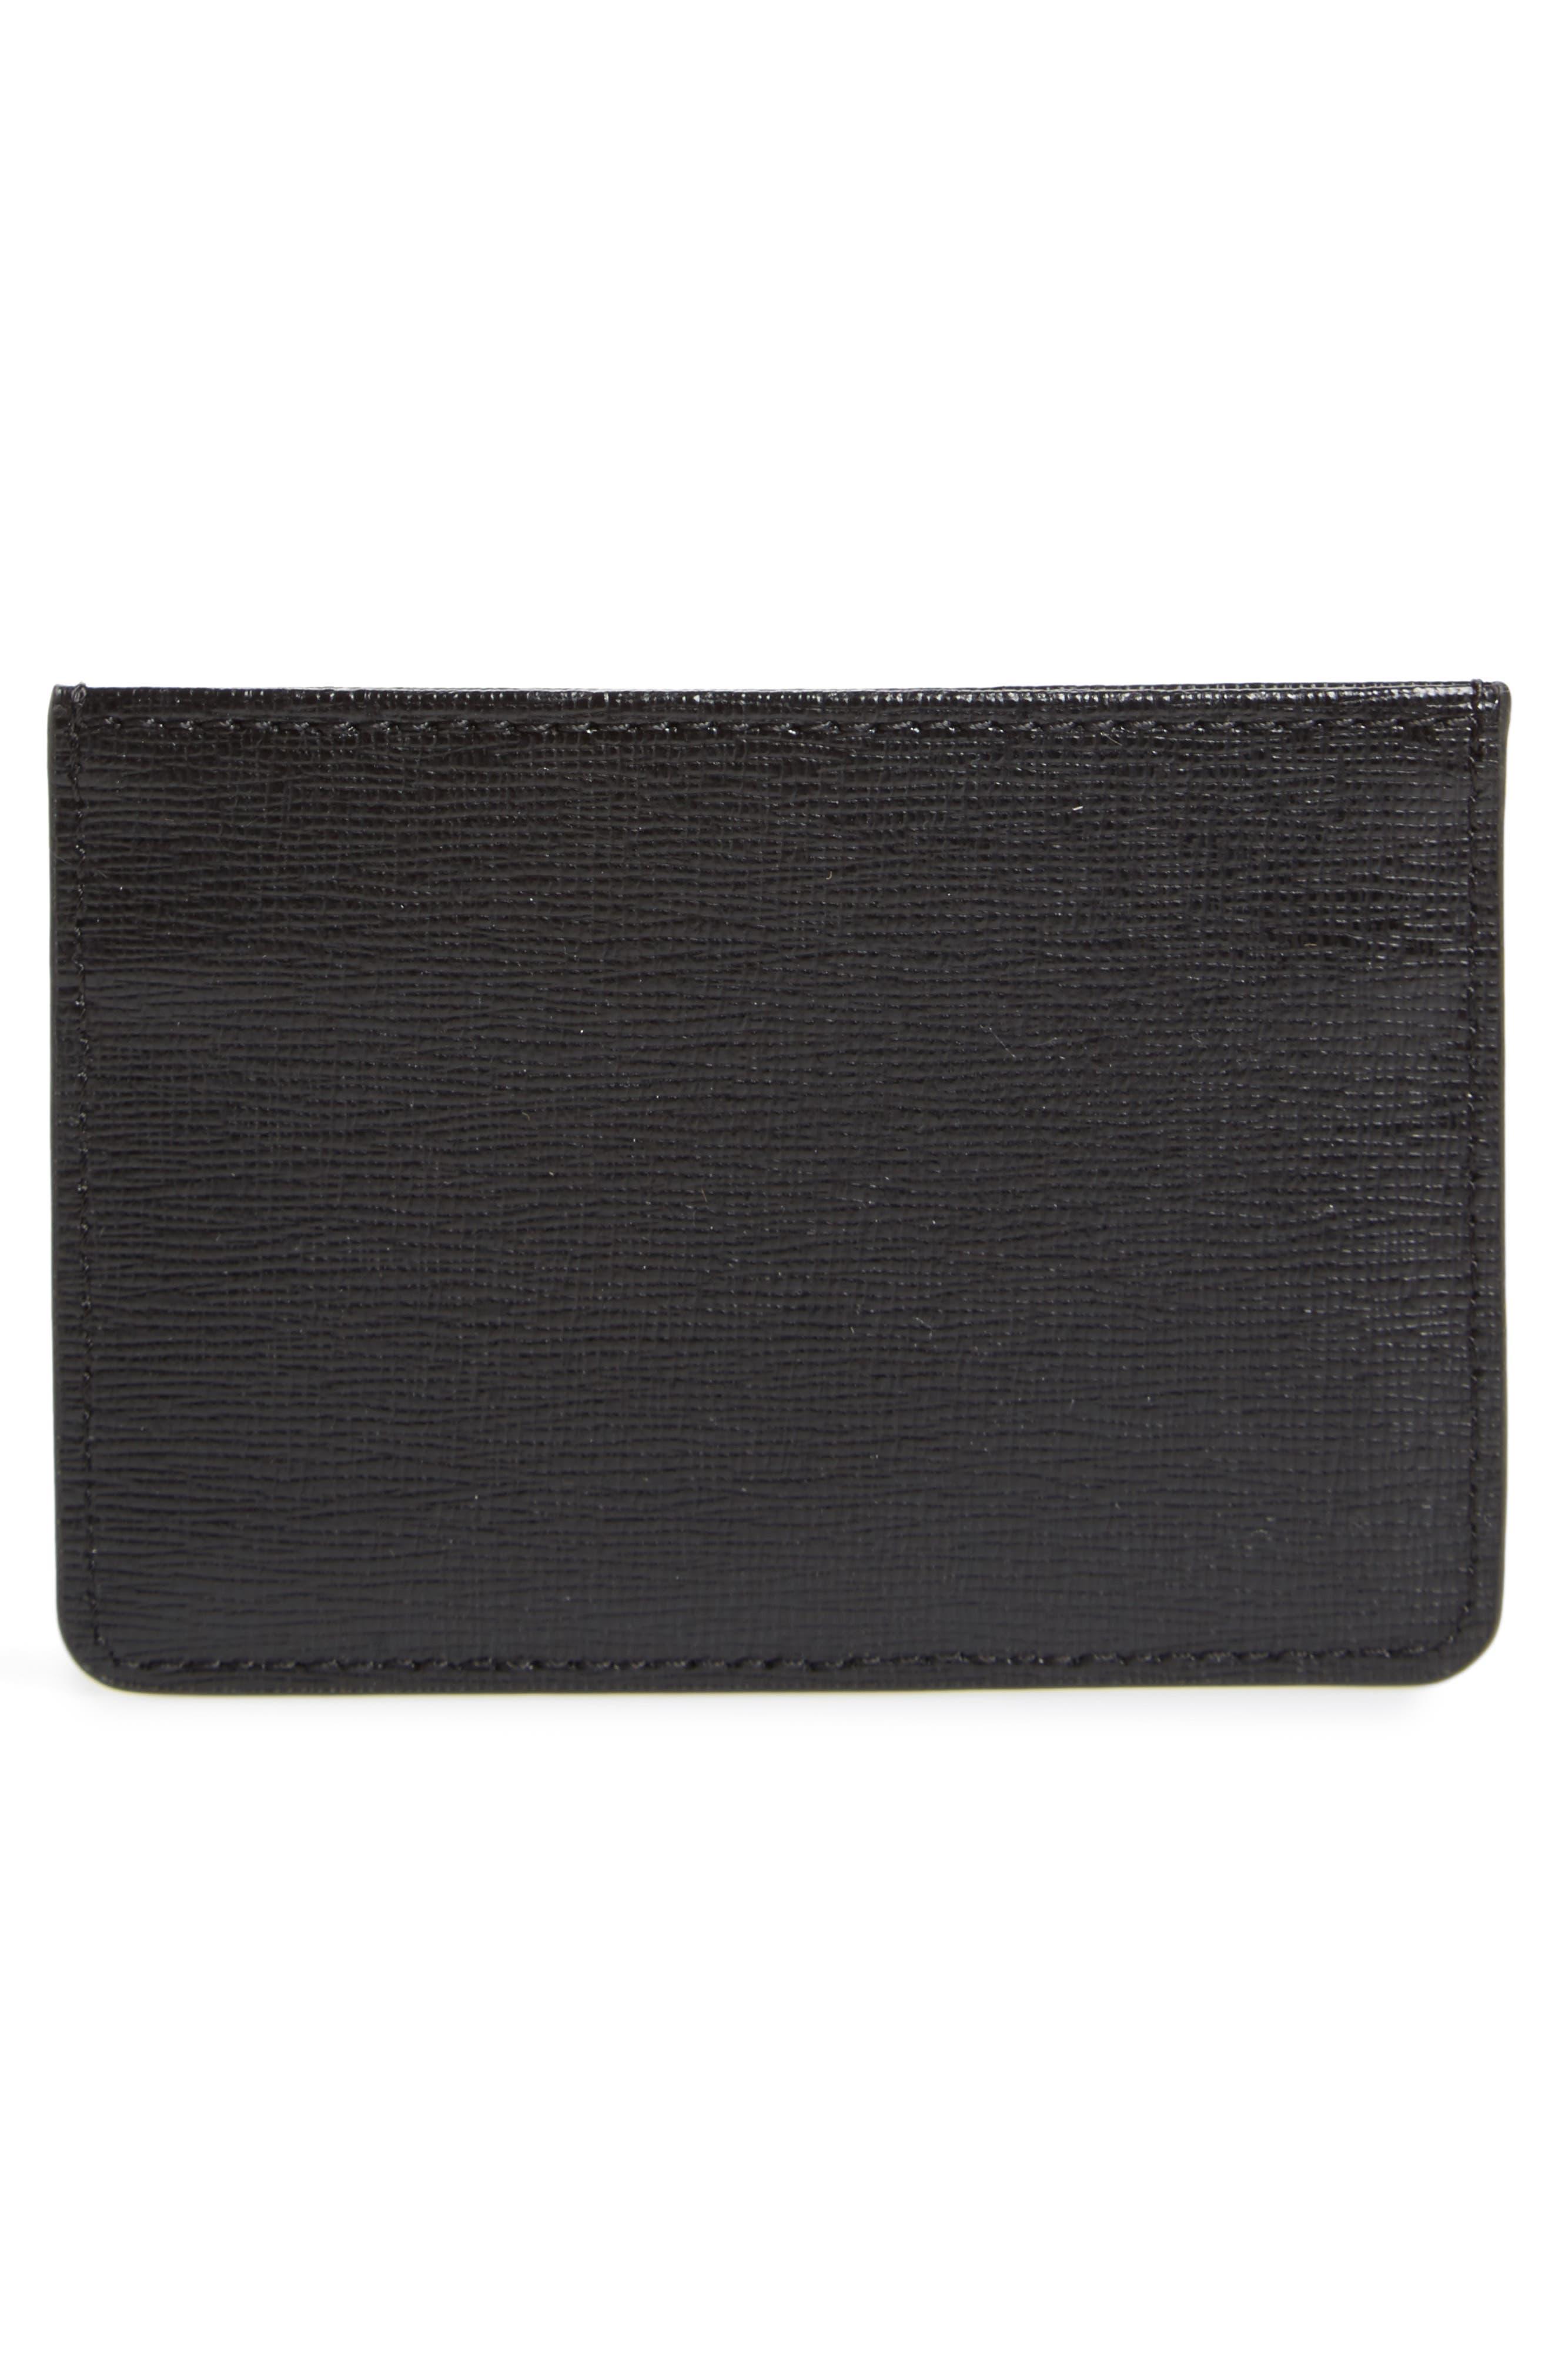 Gioia Saffiano Leather Card Case,                             Alternate thumbnail 2, color,                             004